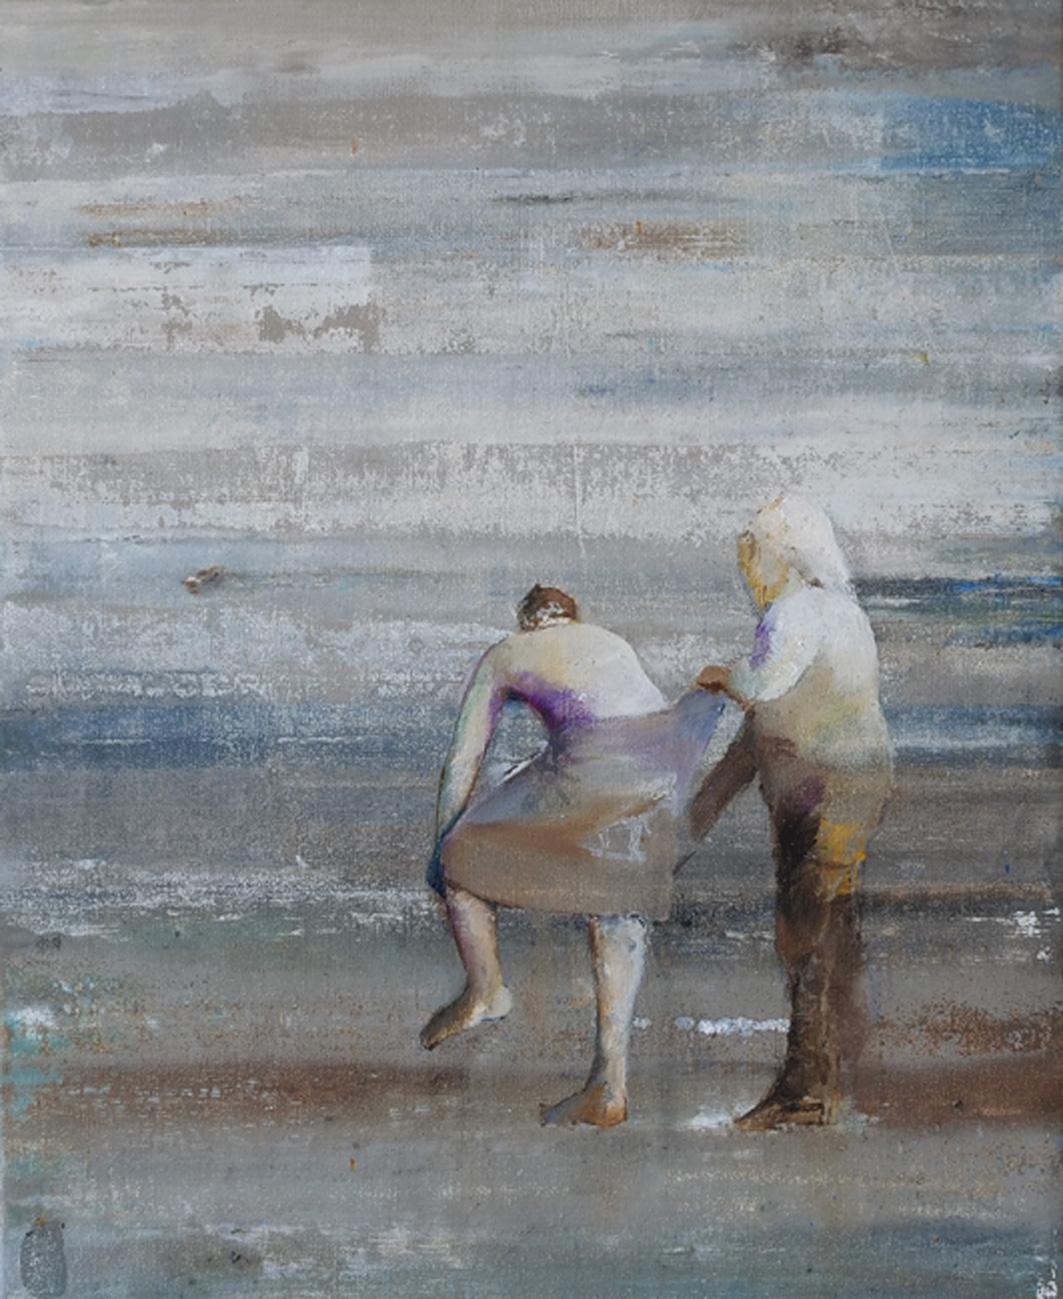 Casper Verborg   equilibrium   oil and spray paint on canvas   50 x 40 cm   2020